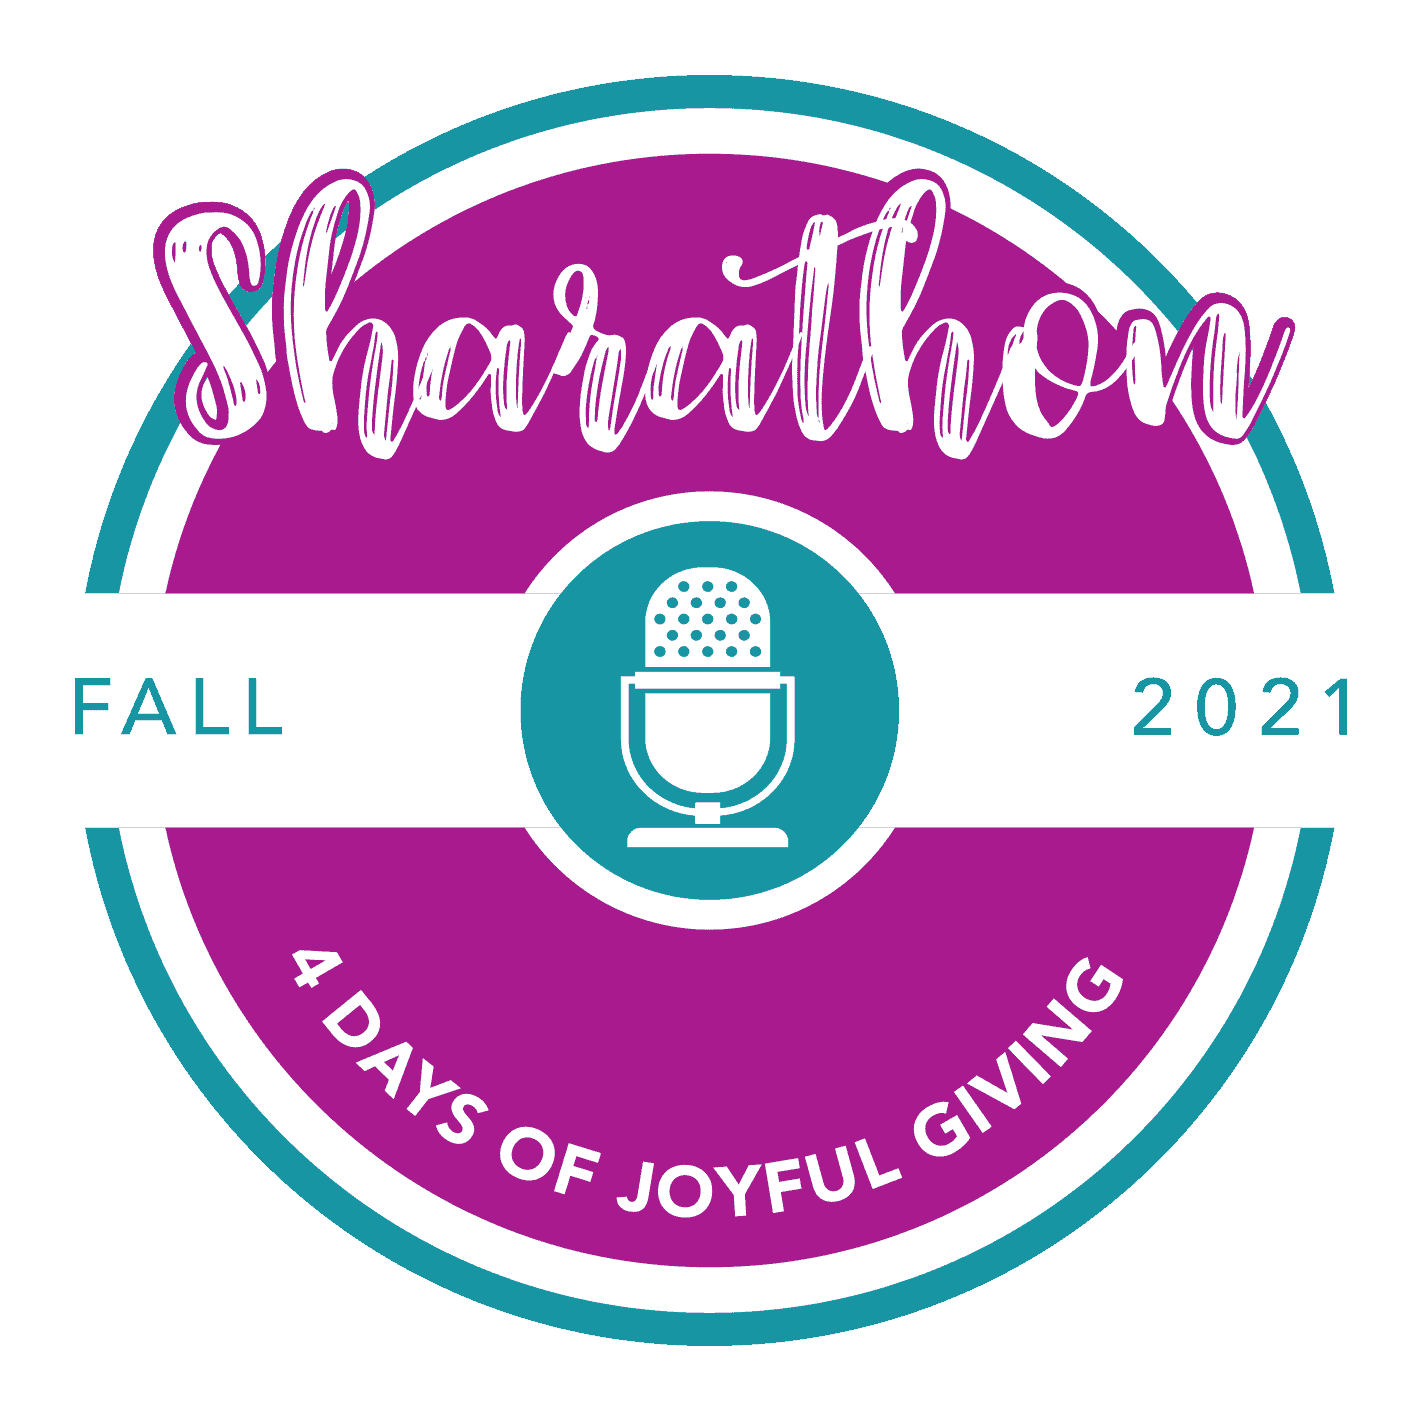 Sharathon_Fall_2021_graphic_4_days_joyful_giving_outline